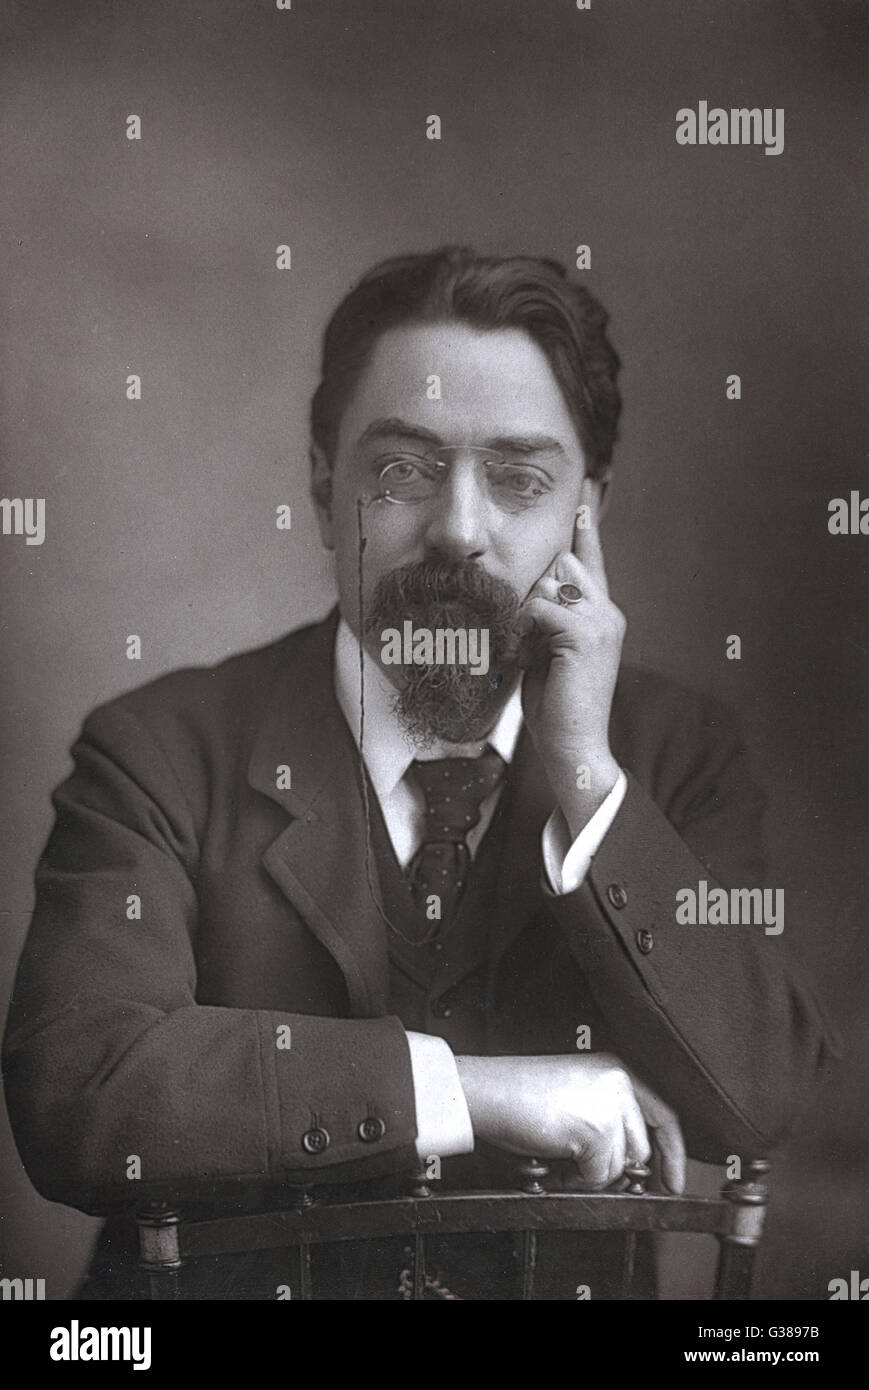 SIDNEY WEBB  economist and social theorist        Date: 1859-1947 - Stock Image